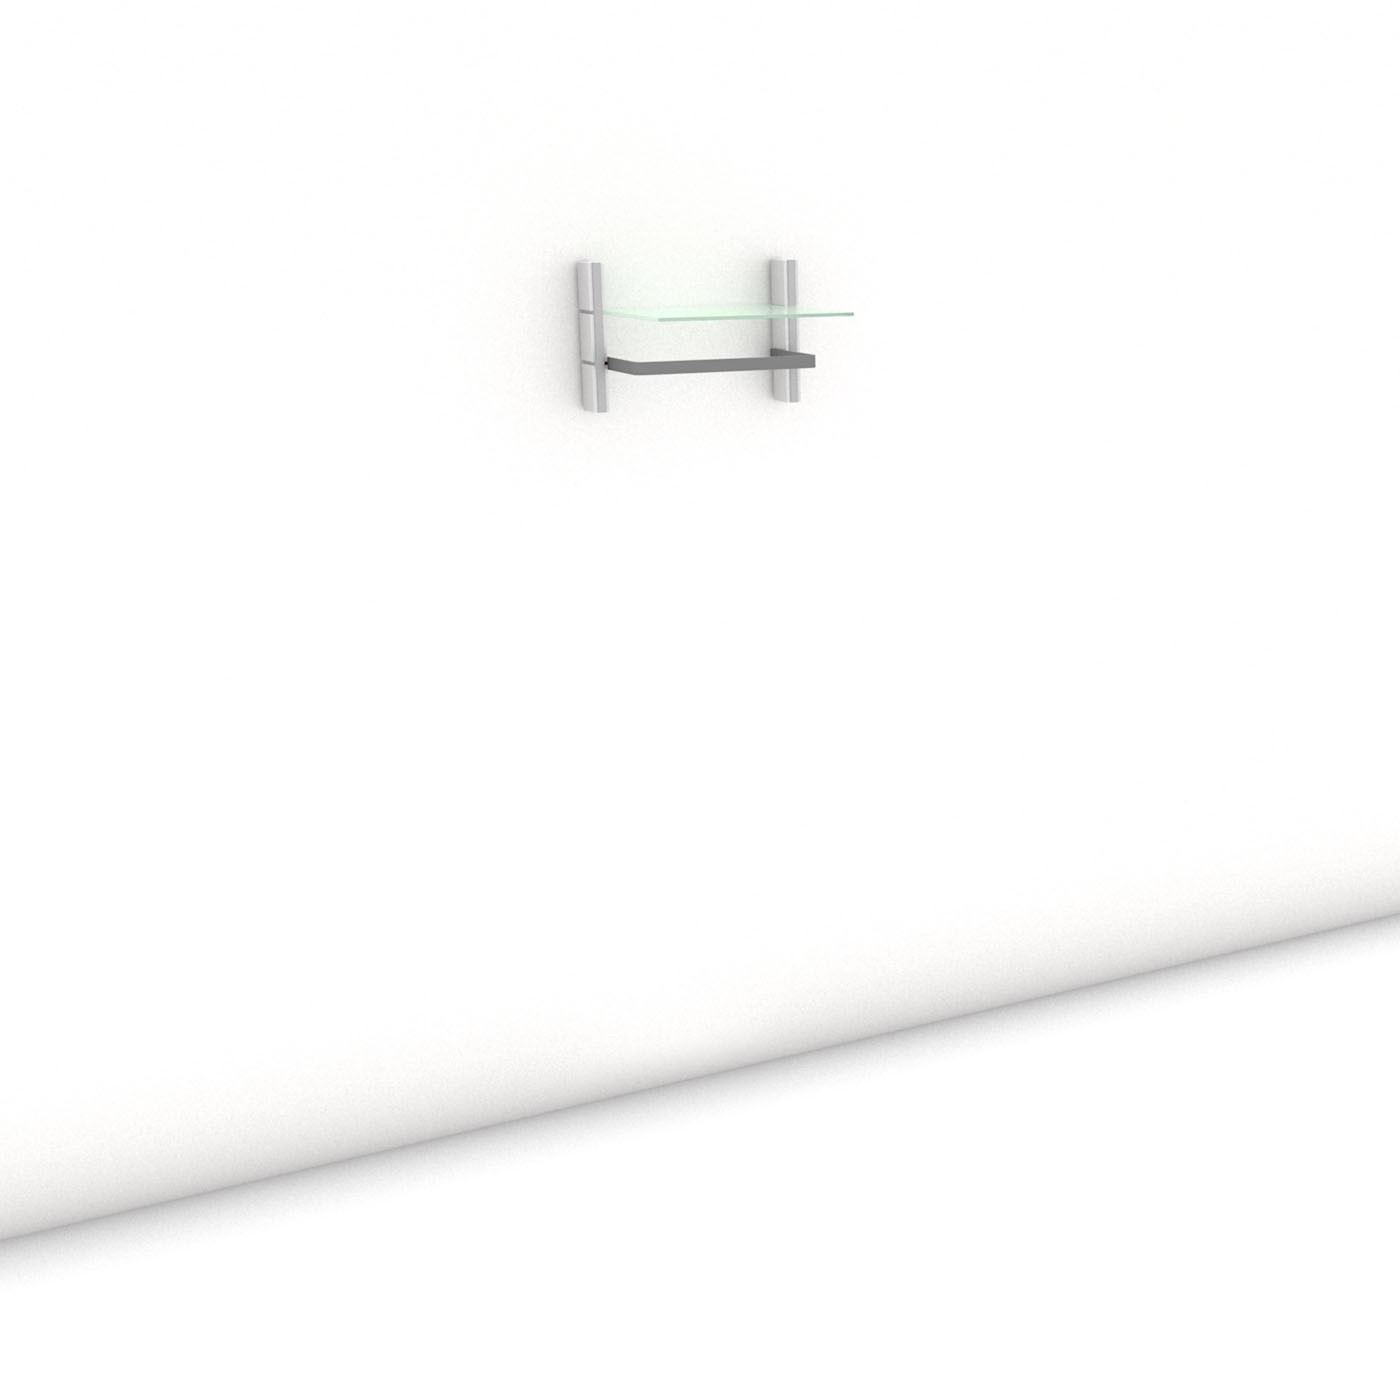 Garderobe - COAT-RACK - Comfort (S) 54 - Maß: 54 x 35,2 x 45 cm (B x H x T)